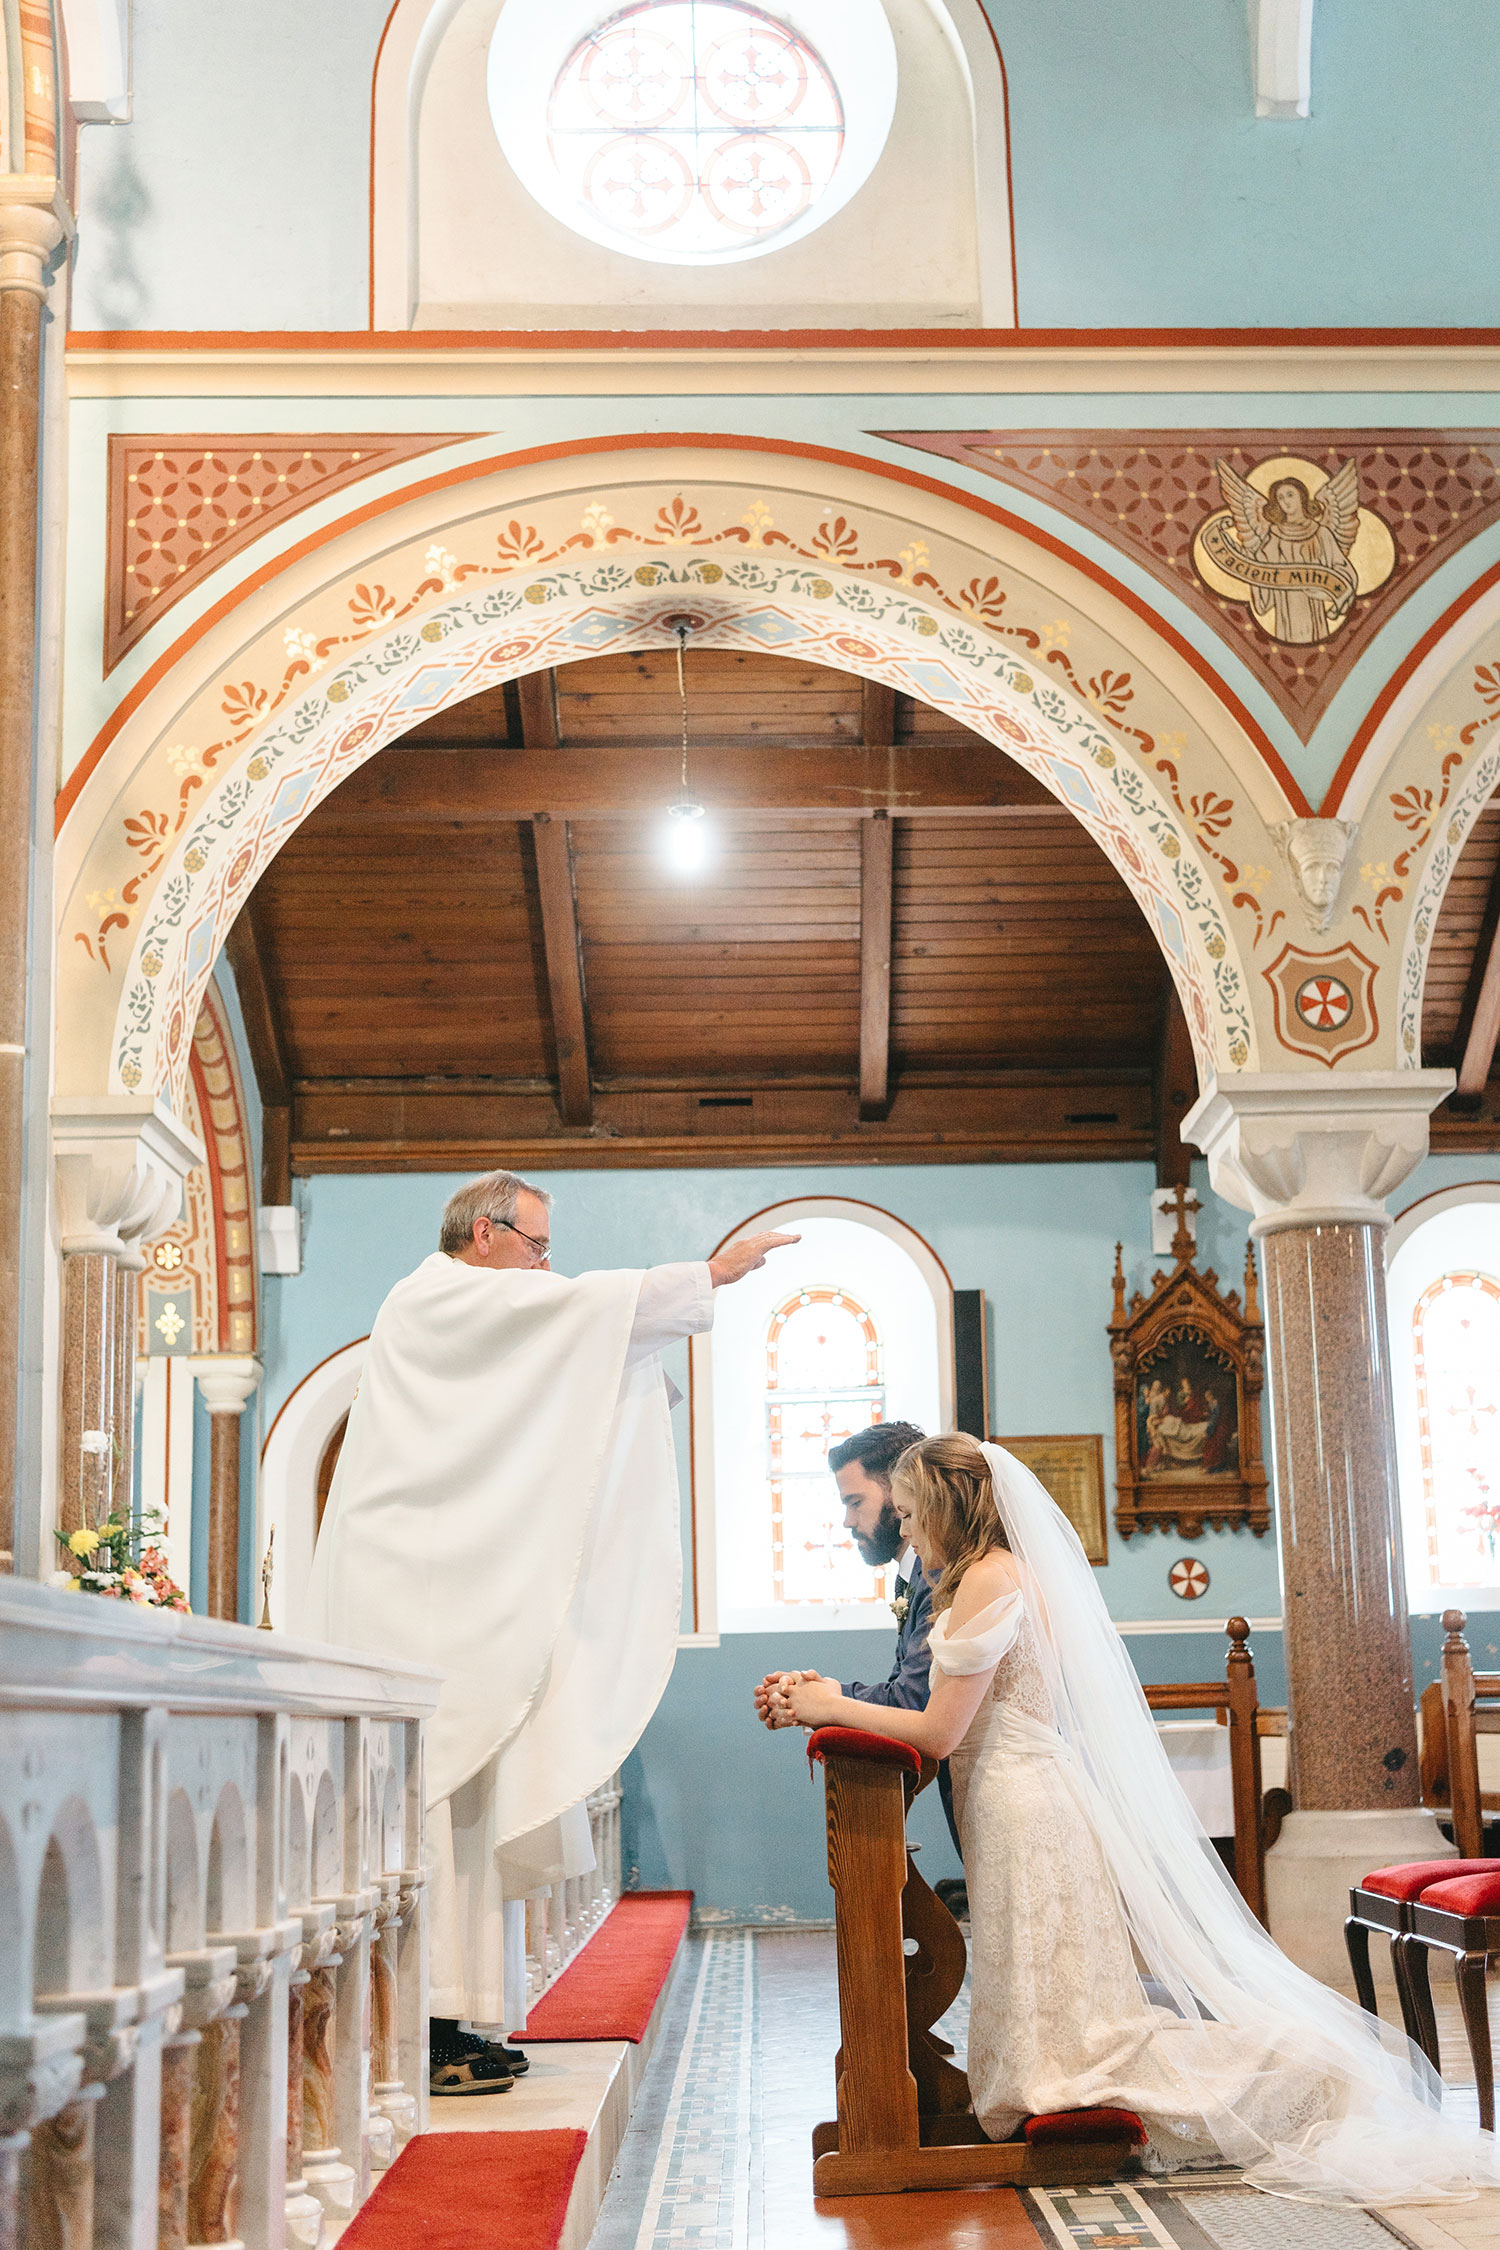 castlemartyr-wedding-photography-0046_0417.jpg